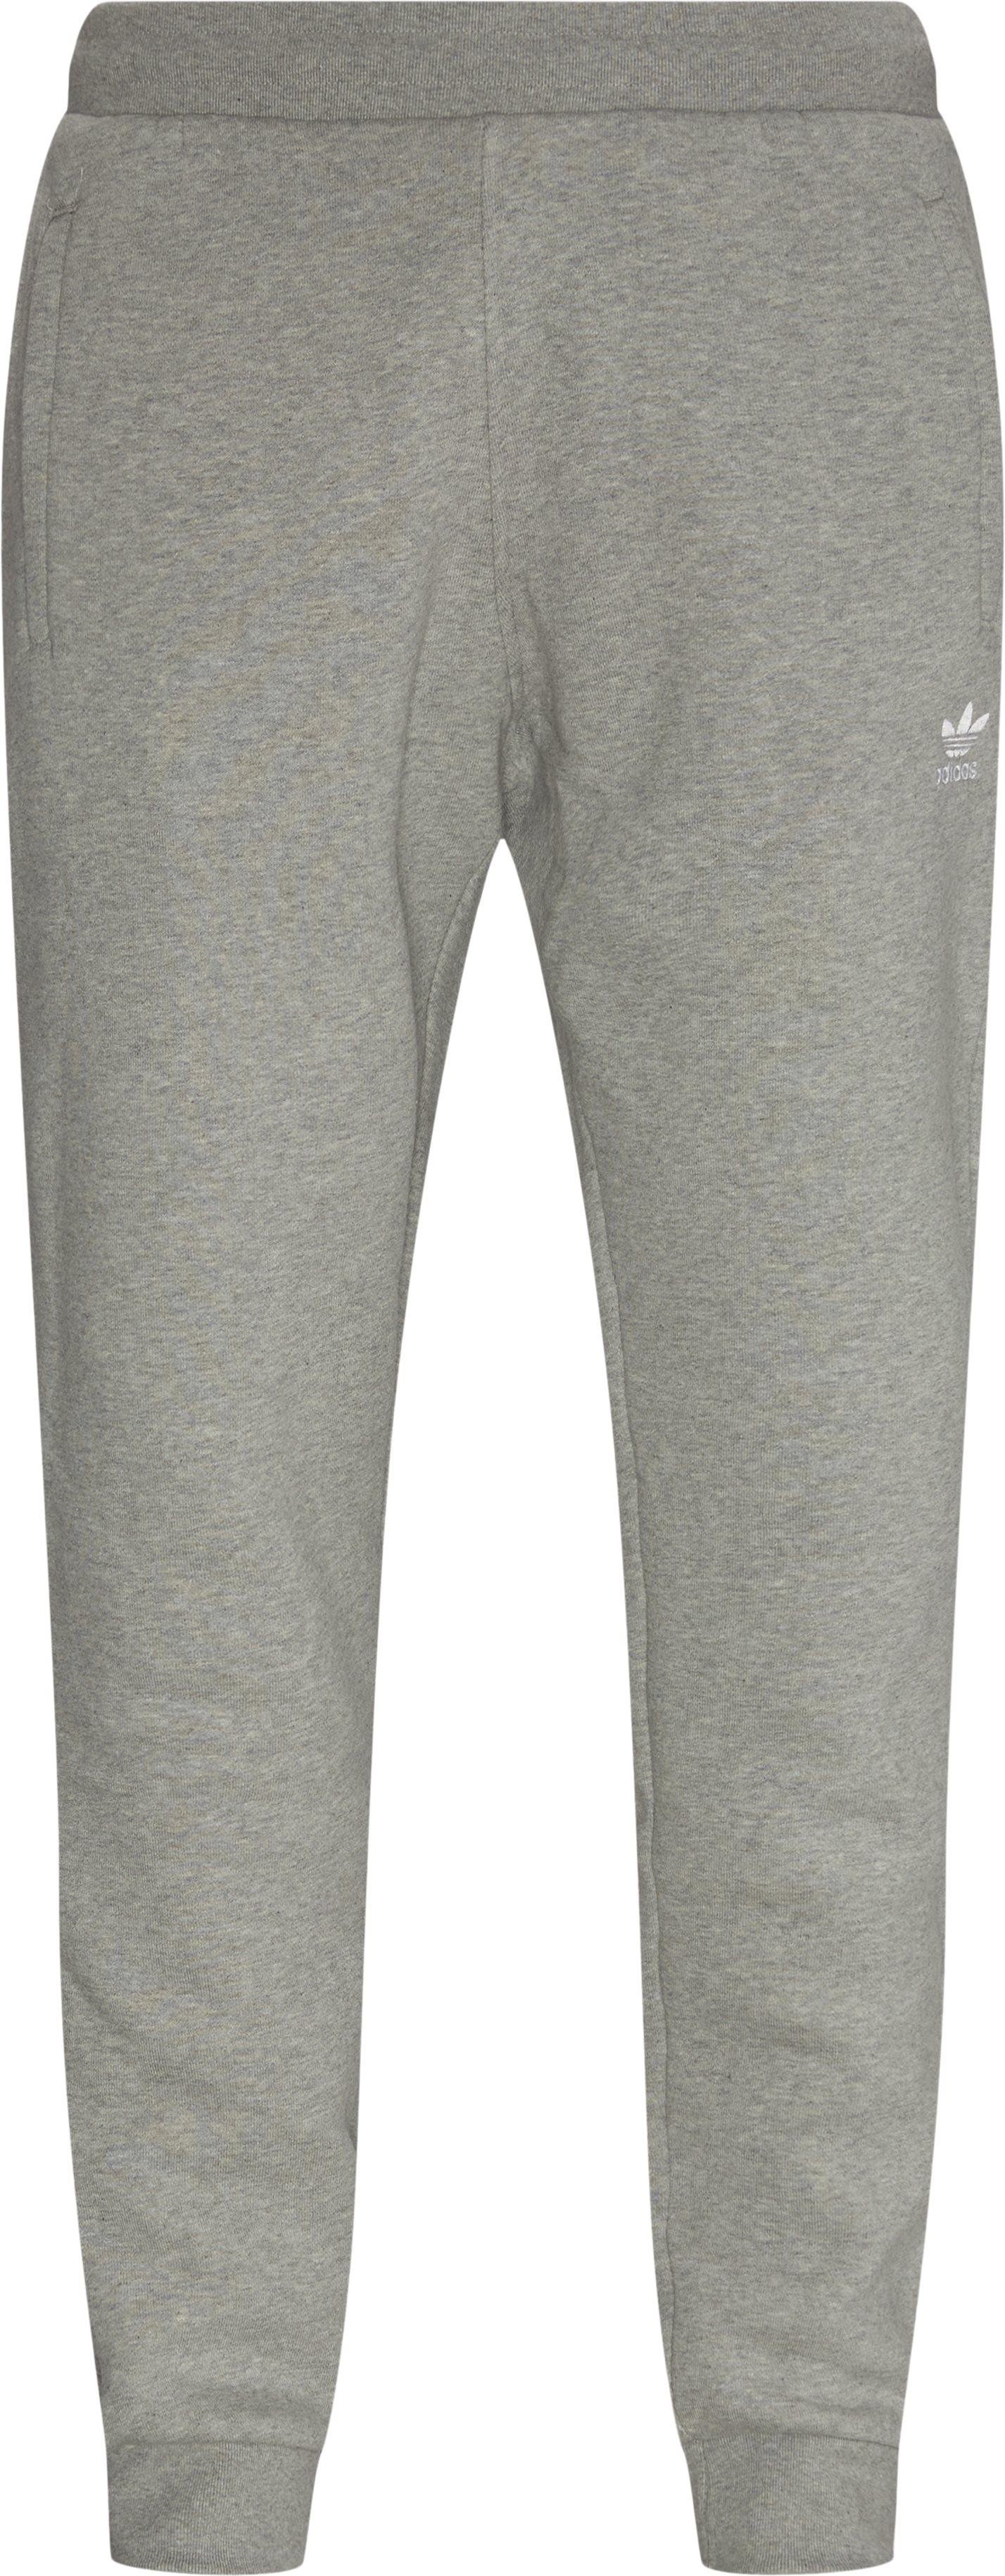 Essential Pants - Bukser - Regular fit - Grå